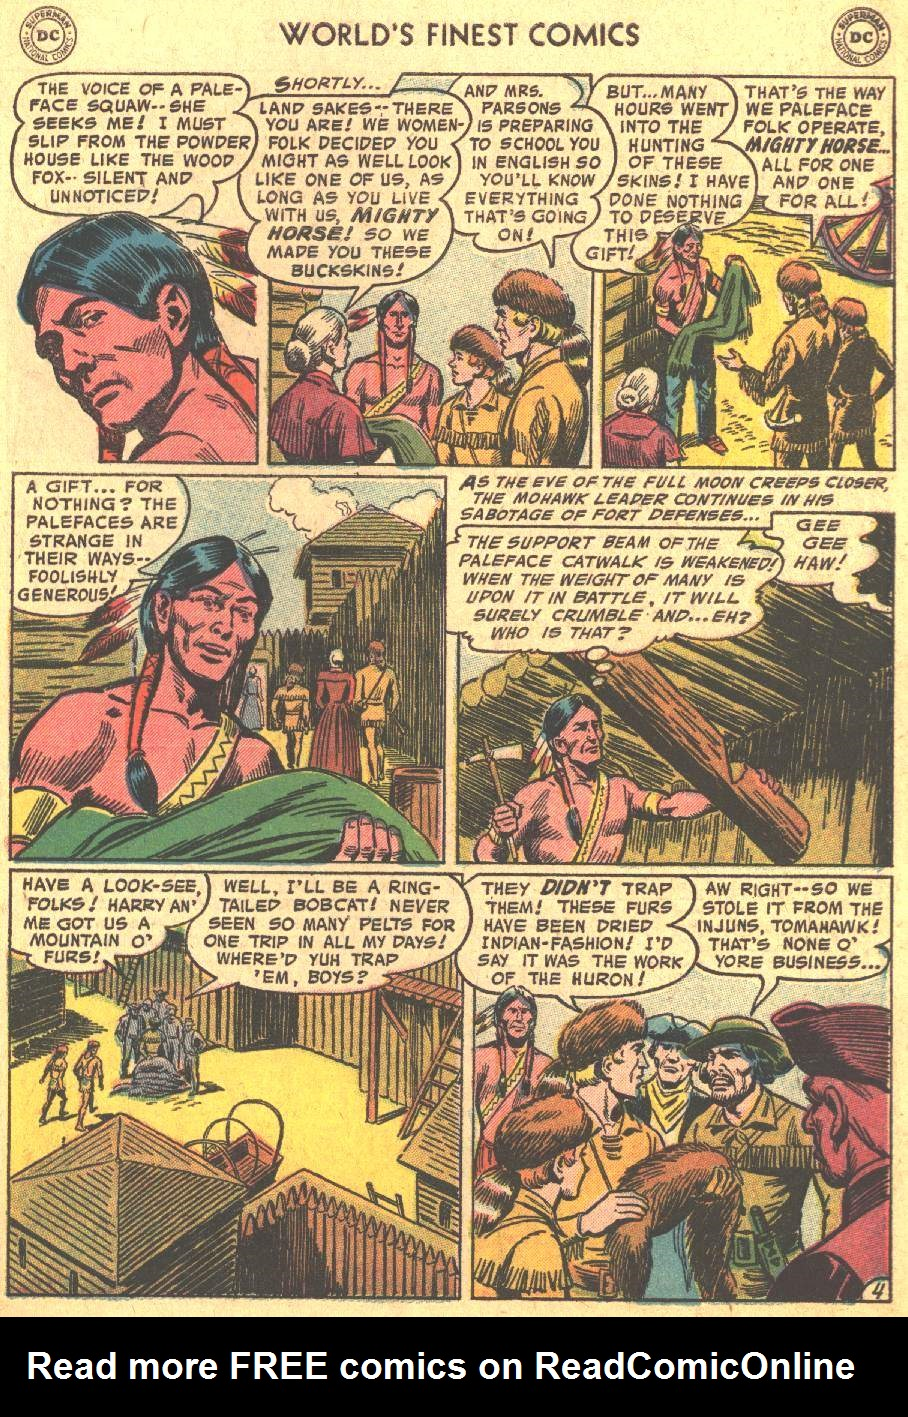 Read online World's Finest Comics comic -  Issue #80 - 31